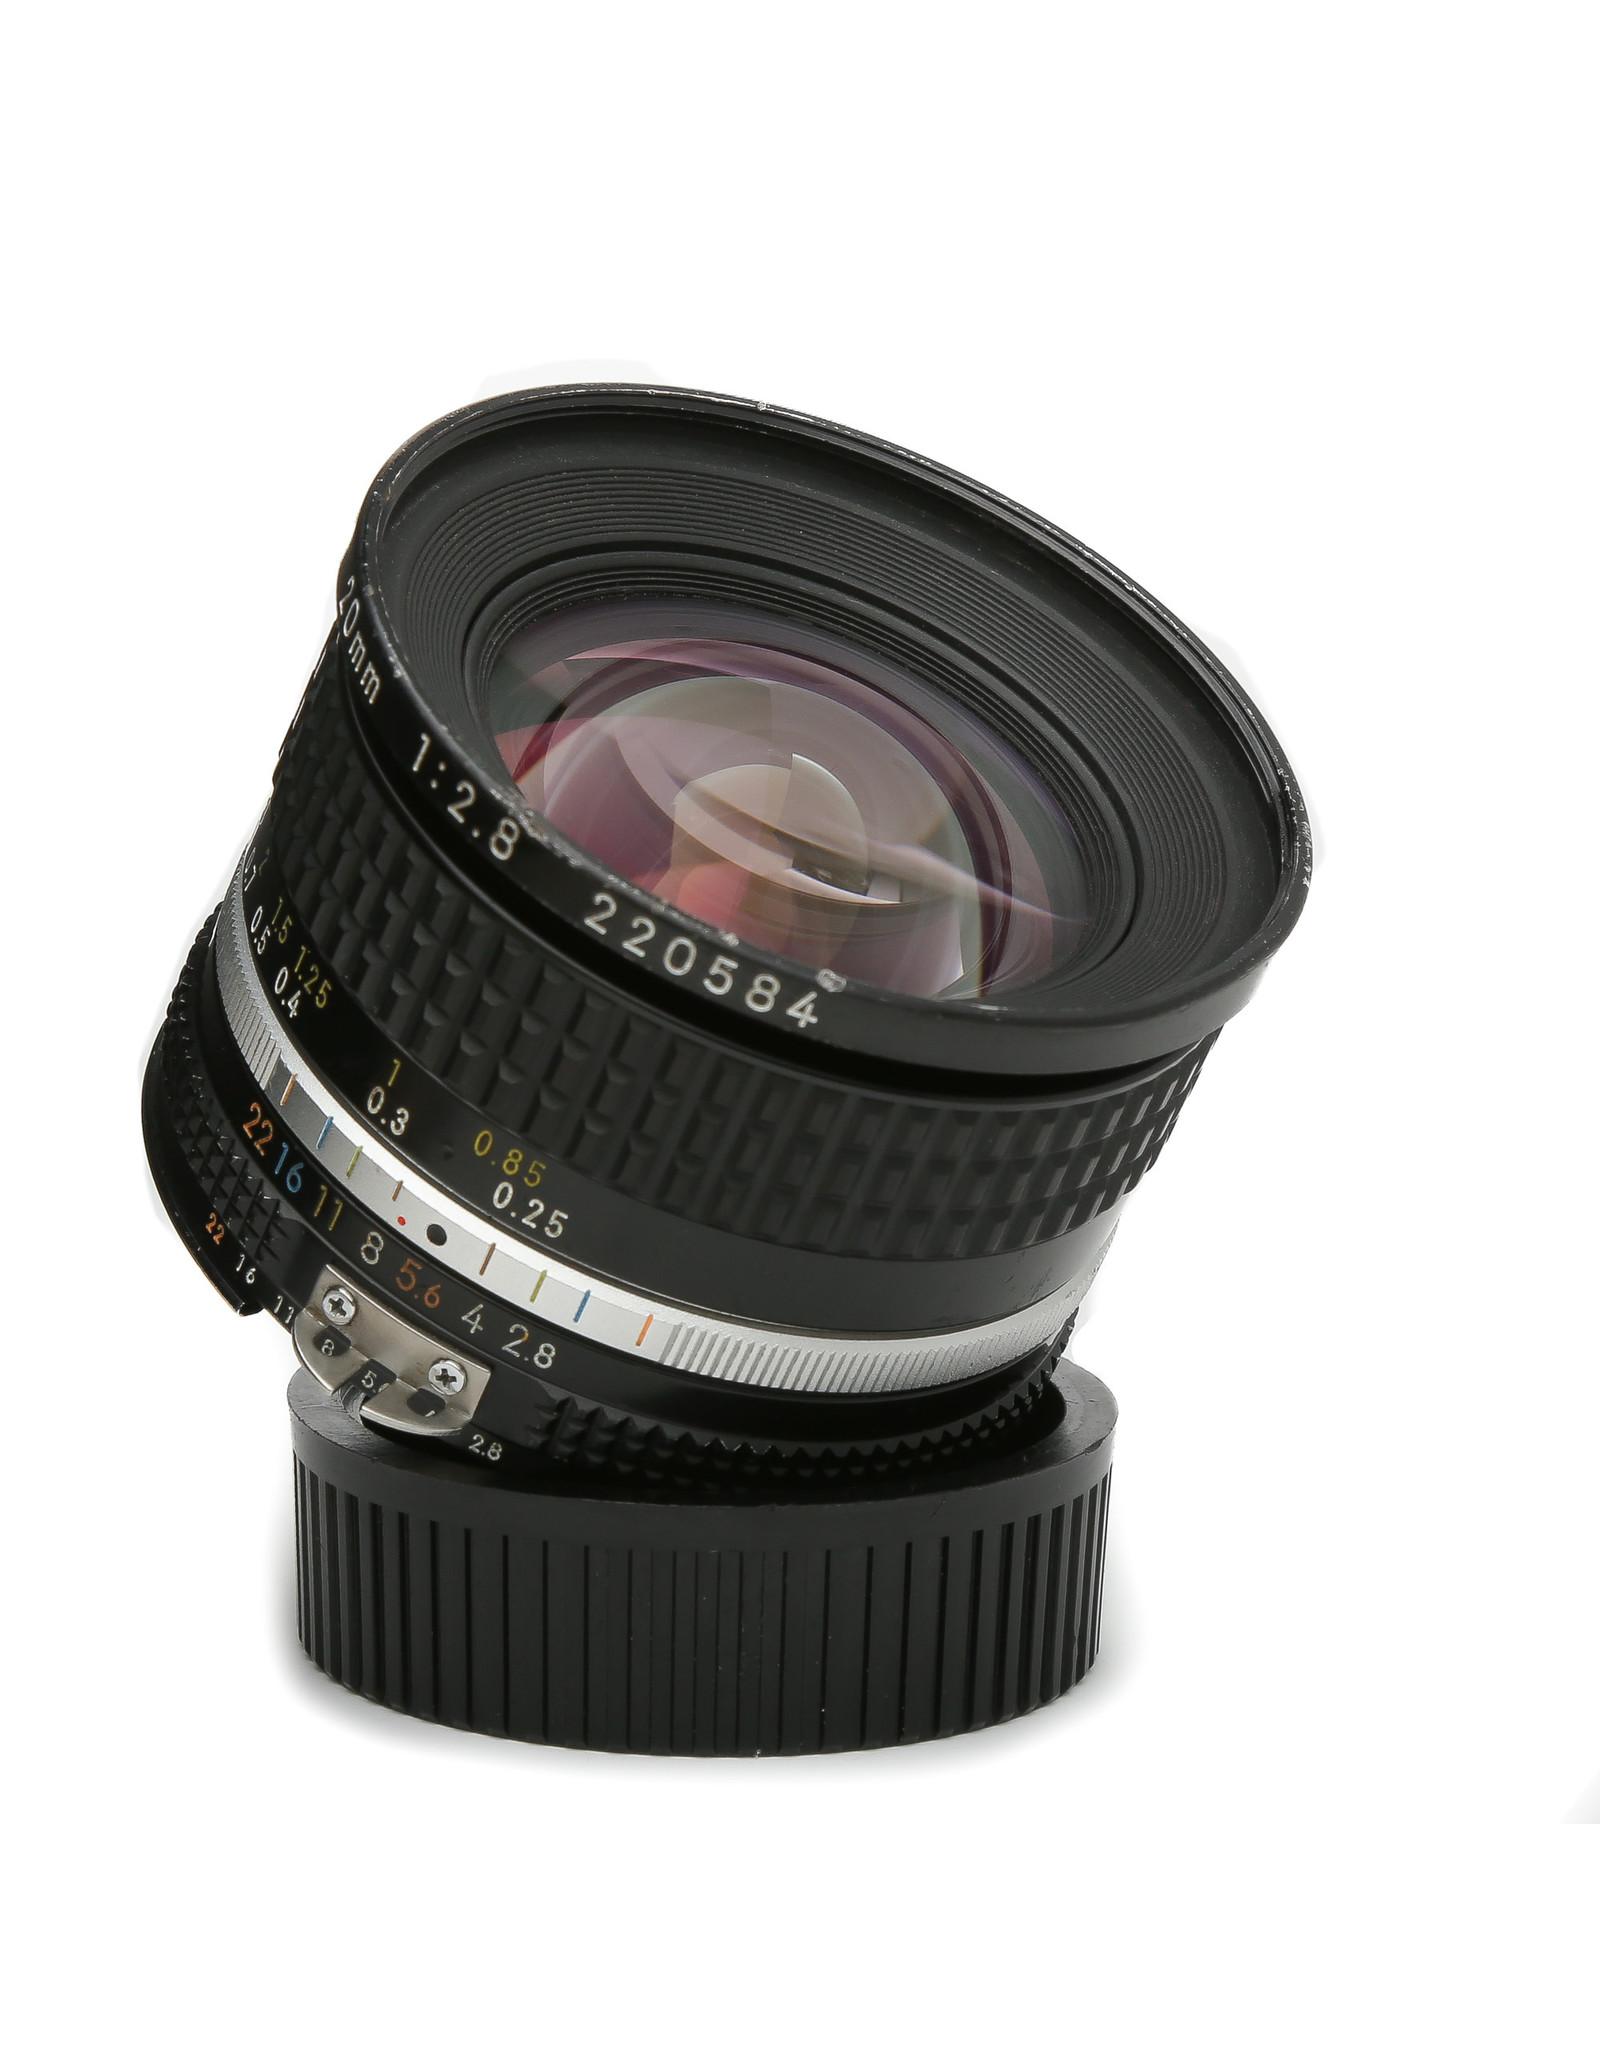 Nikon Nikon Nikkor 20mm f2.8 AiS Lens